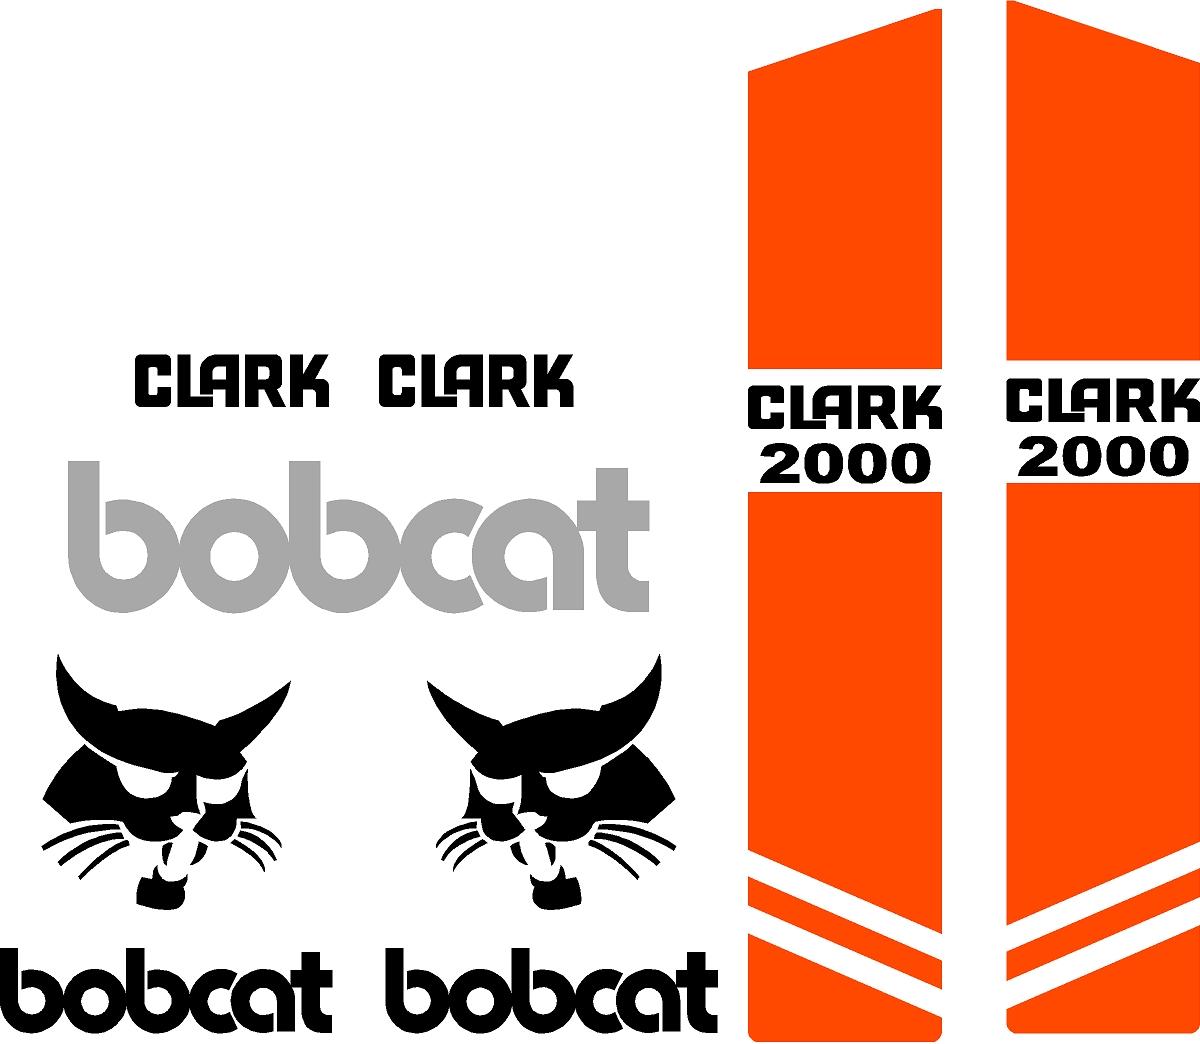 Decal Kits Product : Bobcat clark replacement decal kit